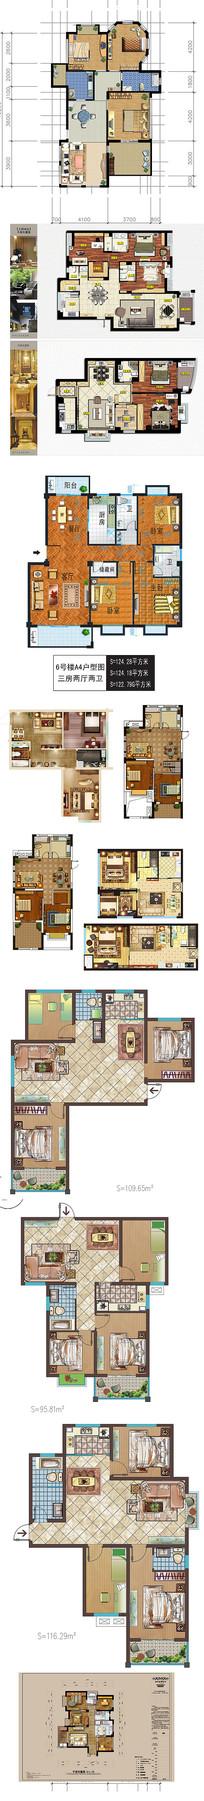 PSD房子彩平效果图素材